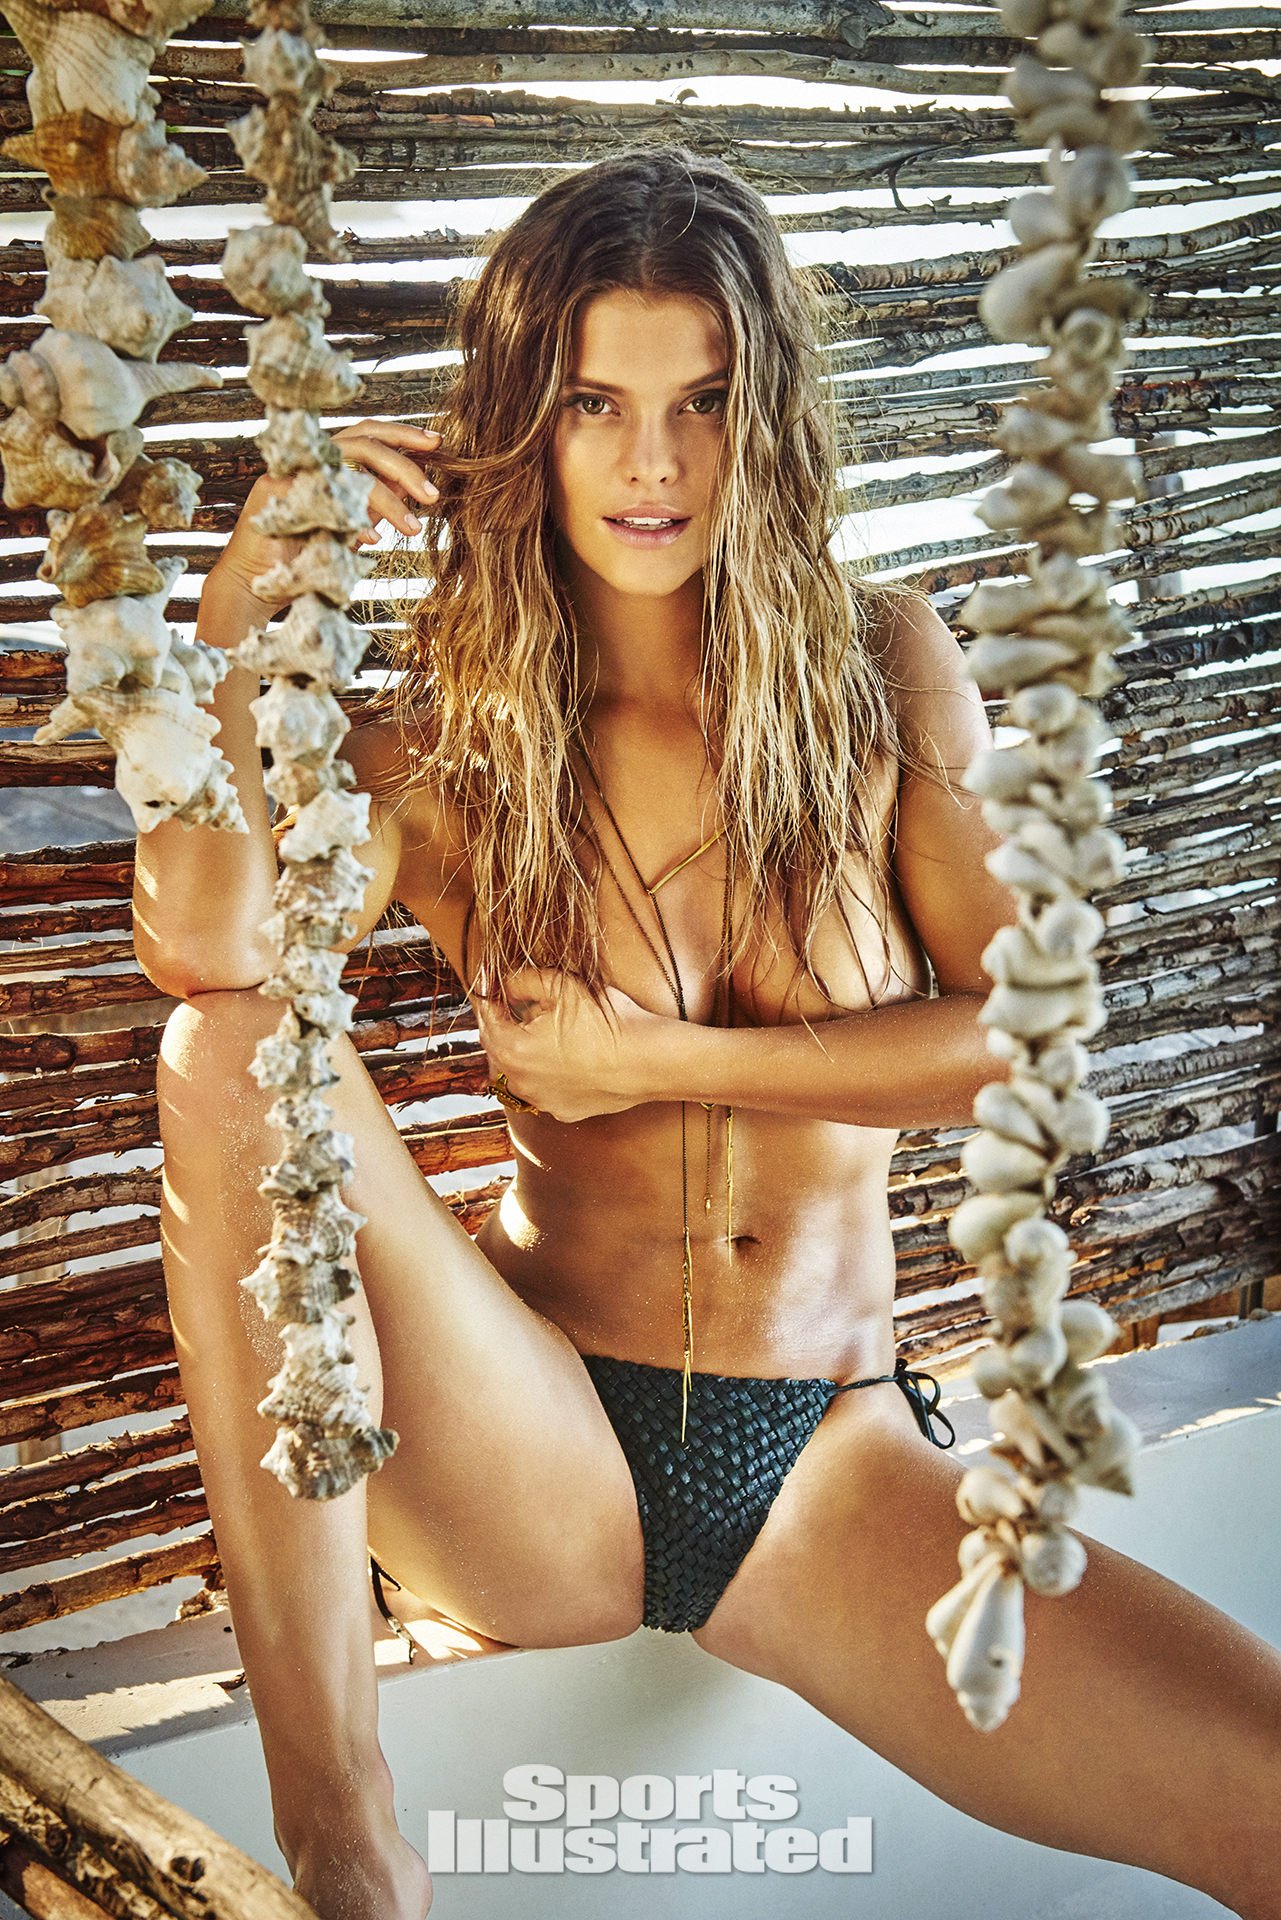 Nina Agdal was photographed by Ruven Afanador in Zanzibar. Swimsuit by Lost Art By Jordan Betten.